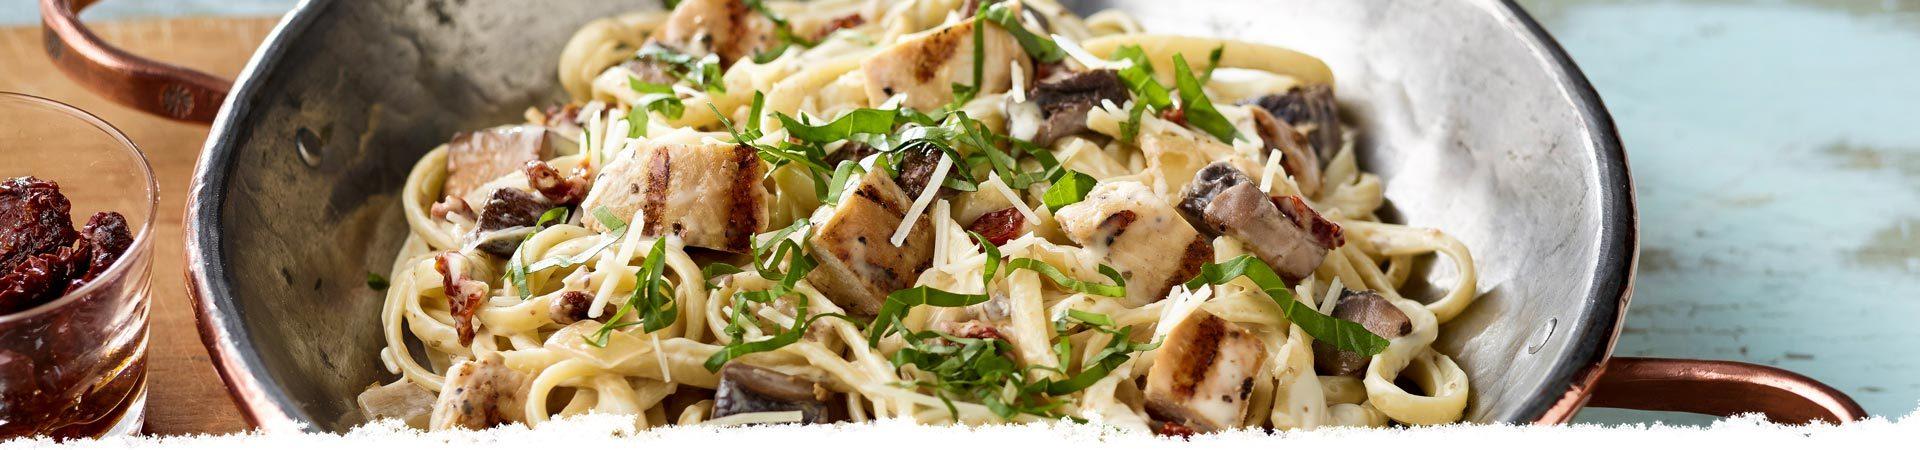 Linguine with Roasted Garlic, Mushrooms, & Chicken